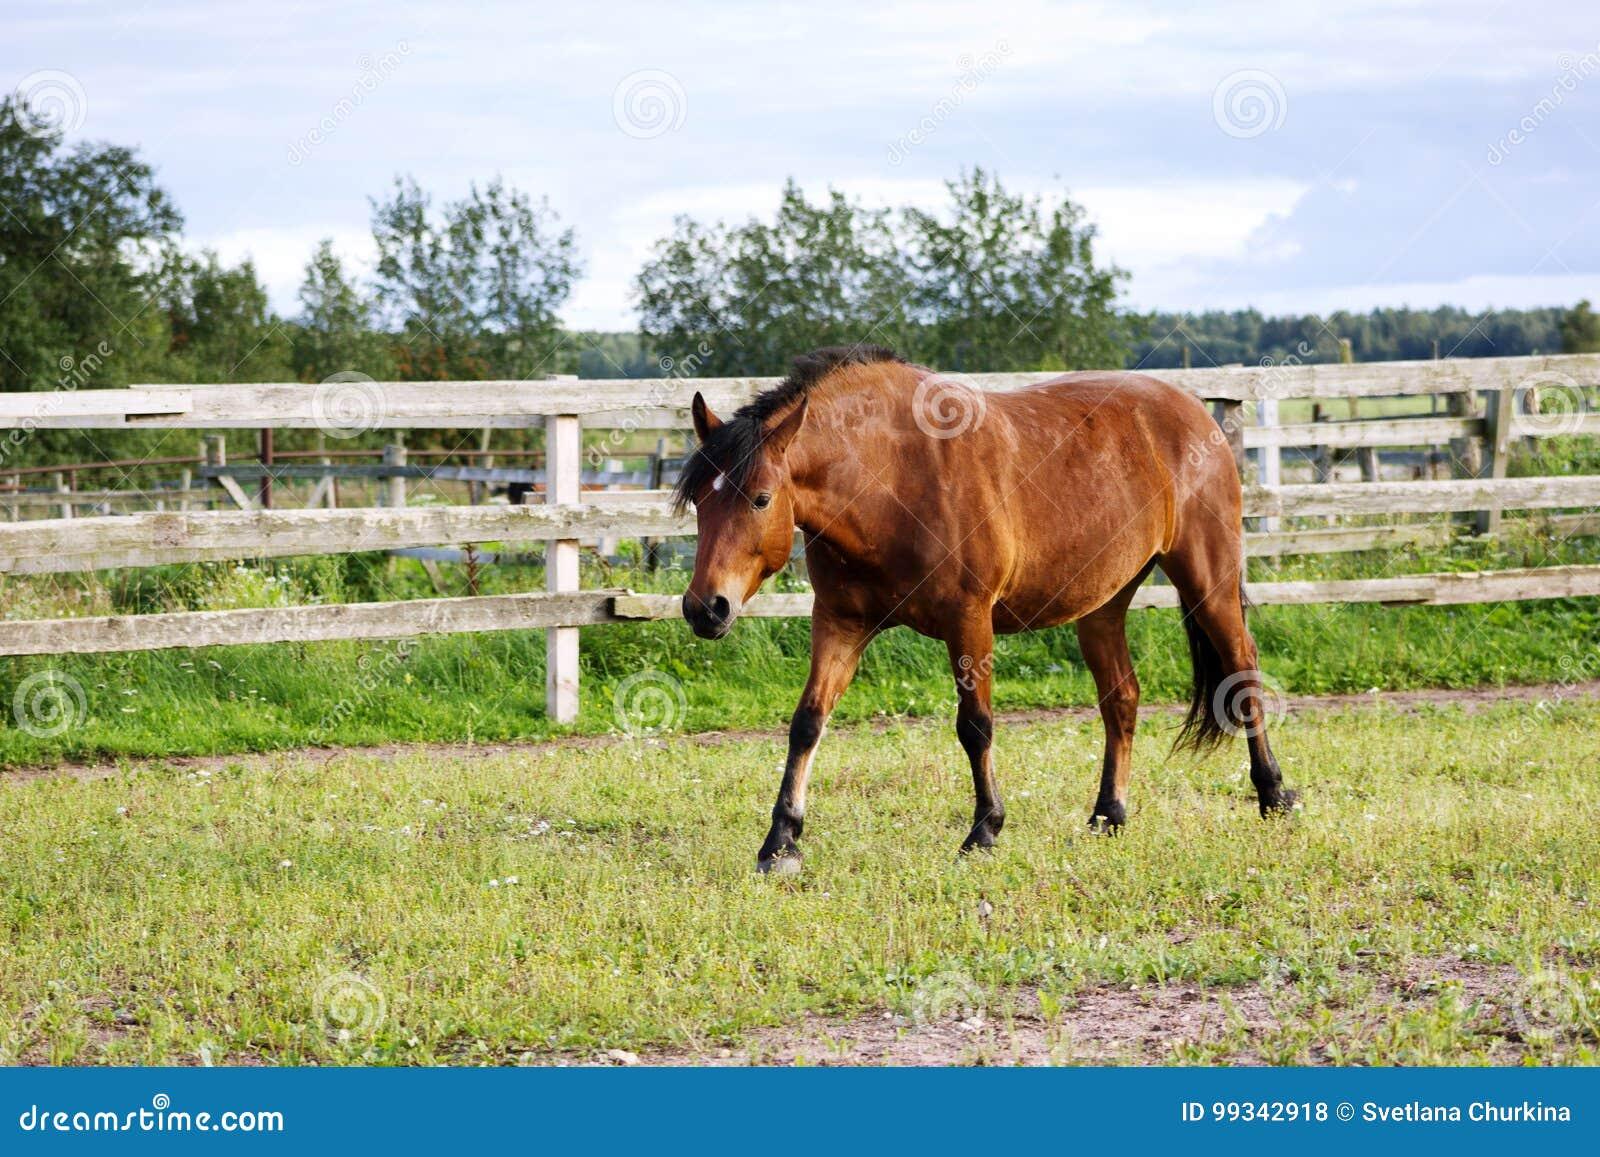 Bay horse walking outdoor